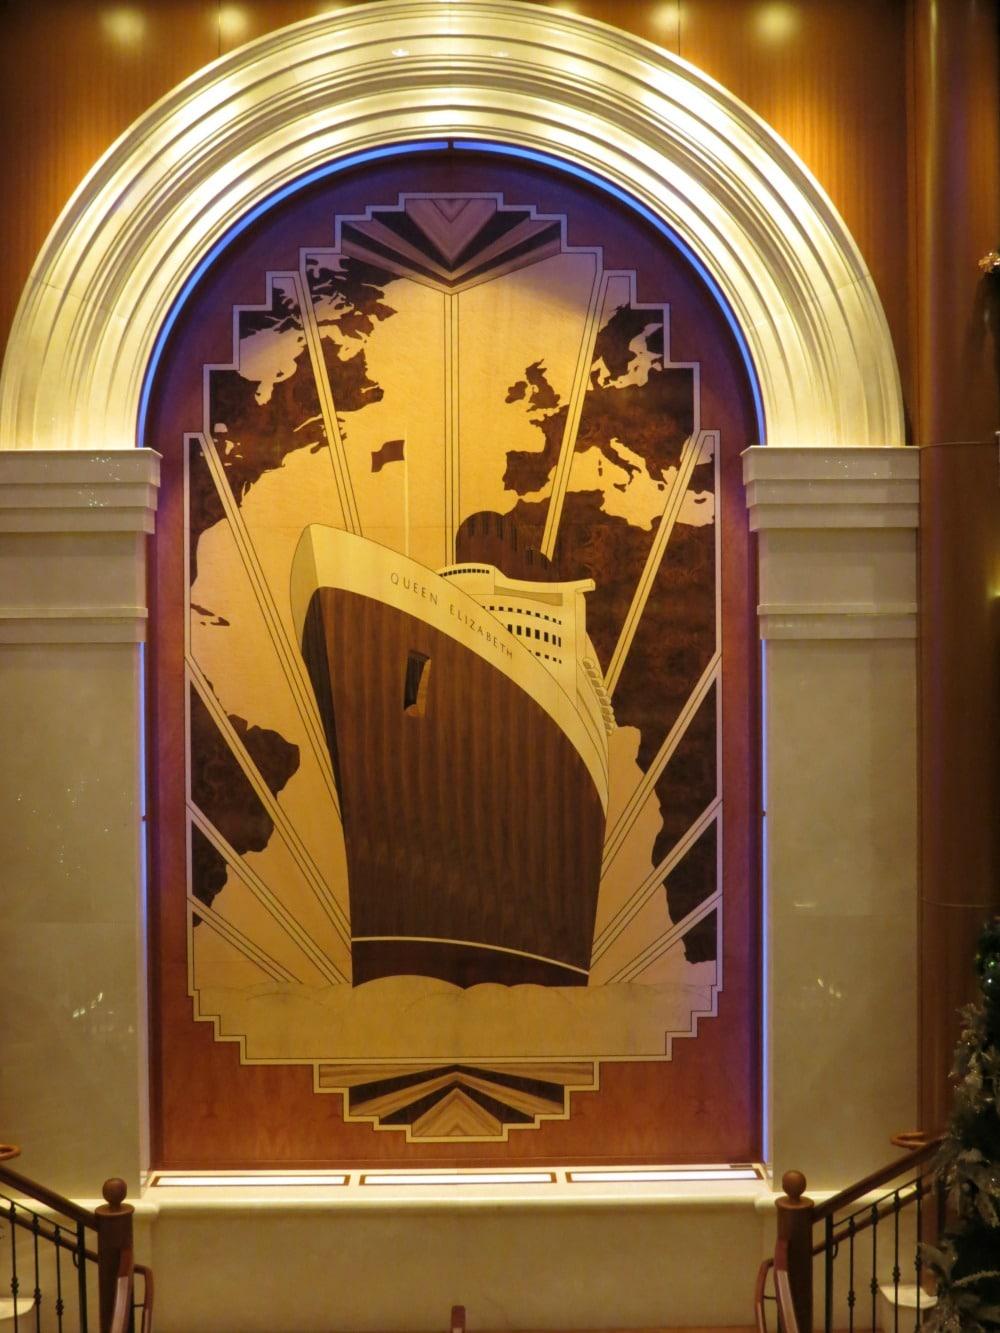 Baby Boomer Travel   Cruising   Cunard Queen Elizabeth - Deco inlaid wood art